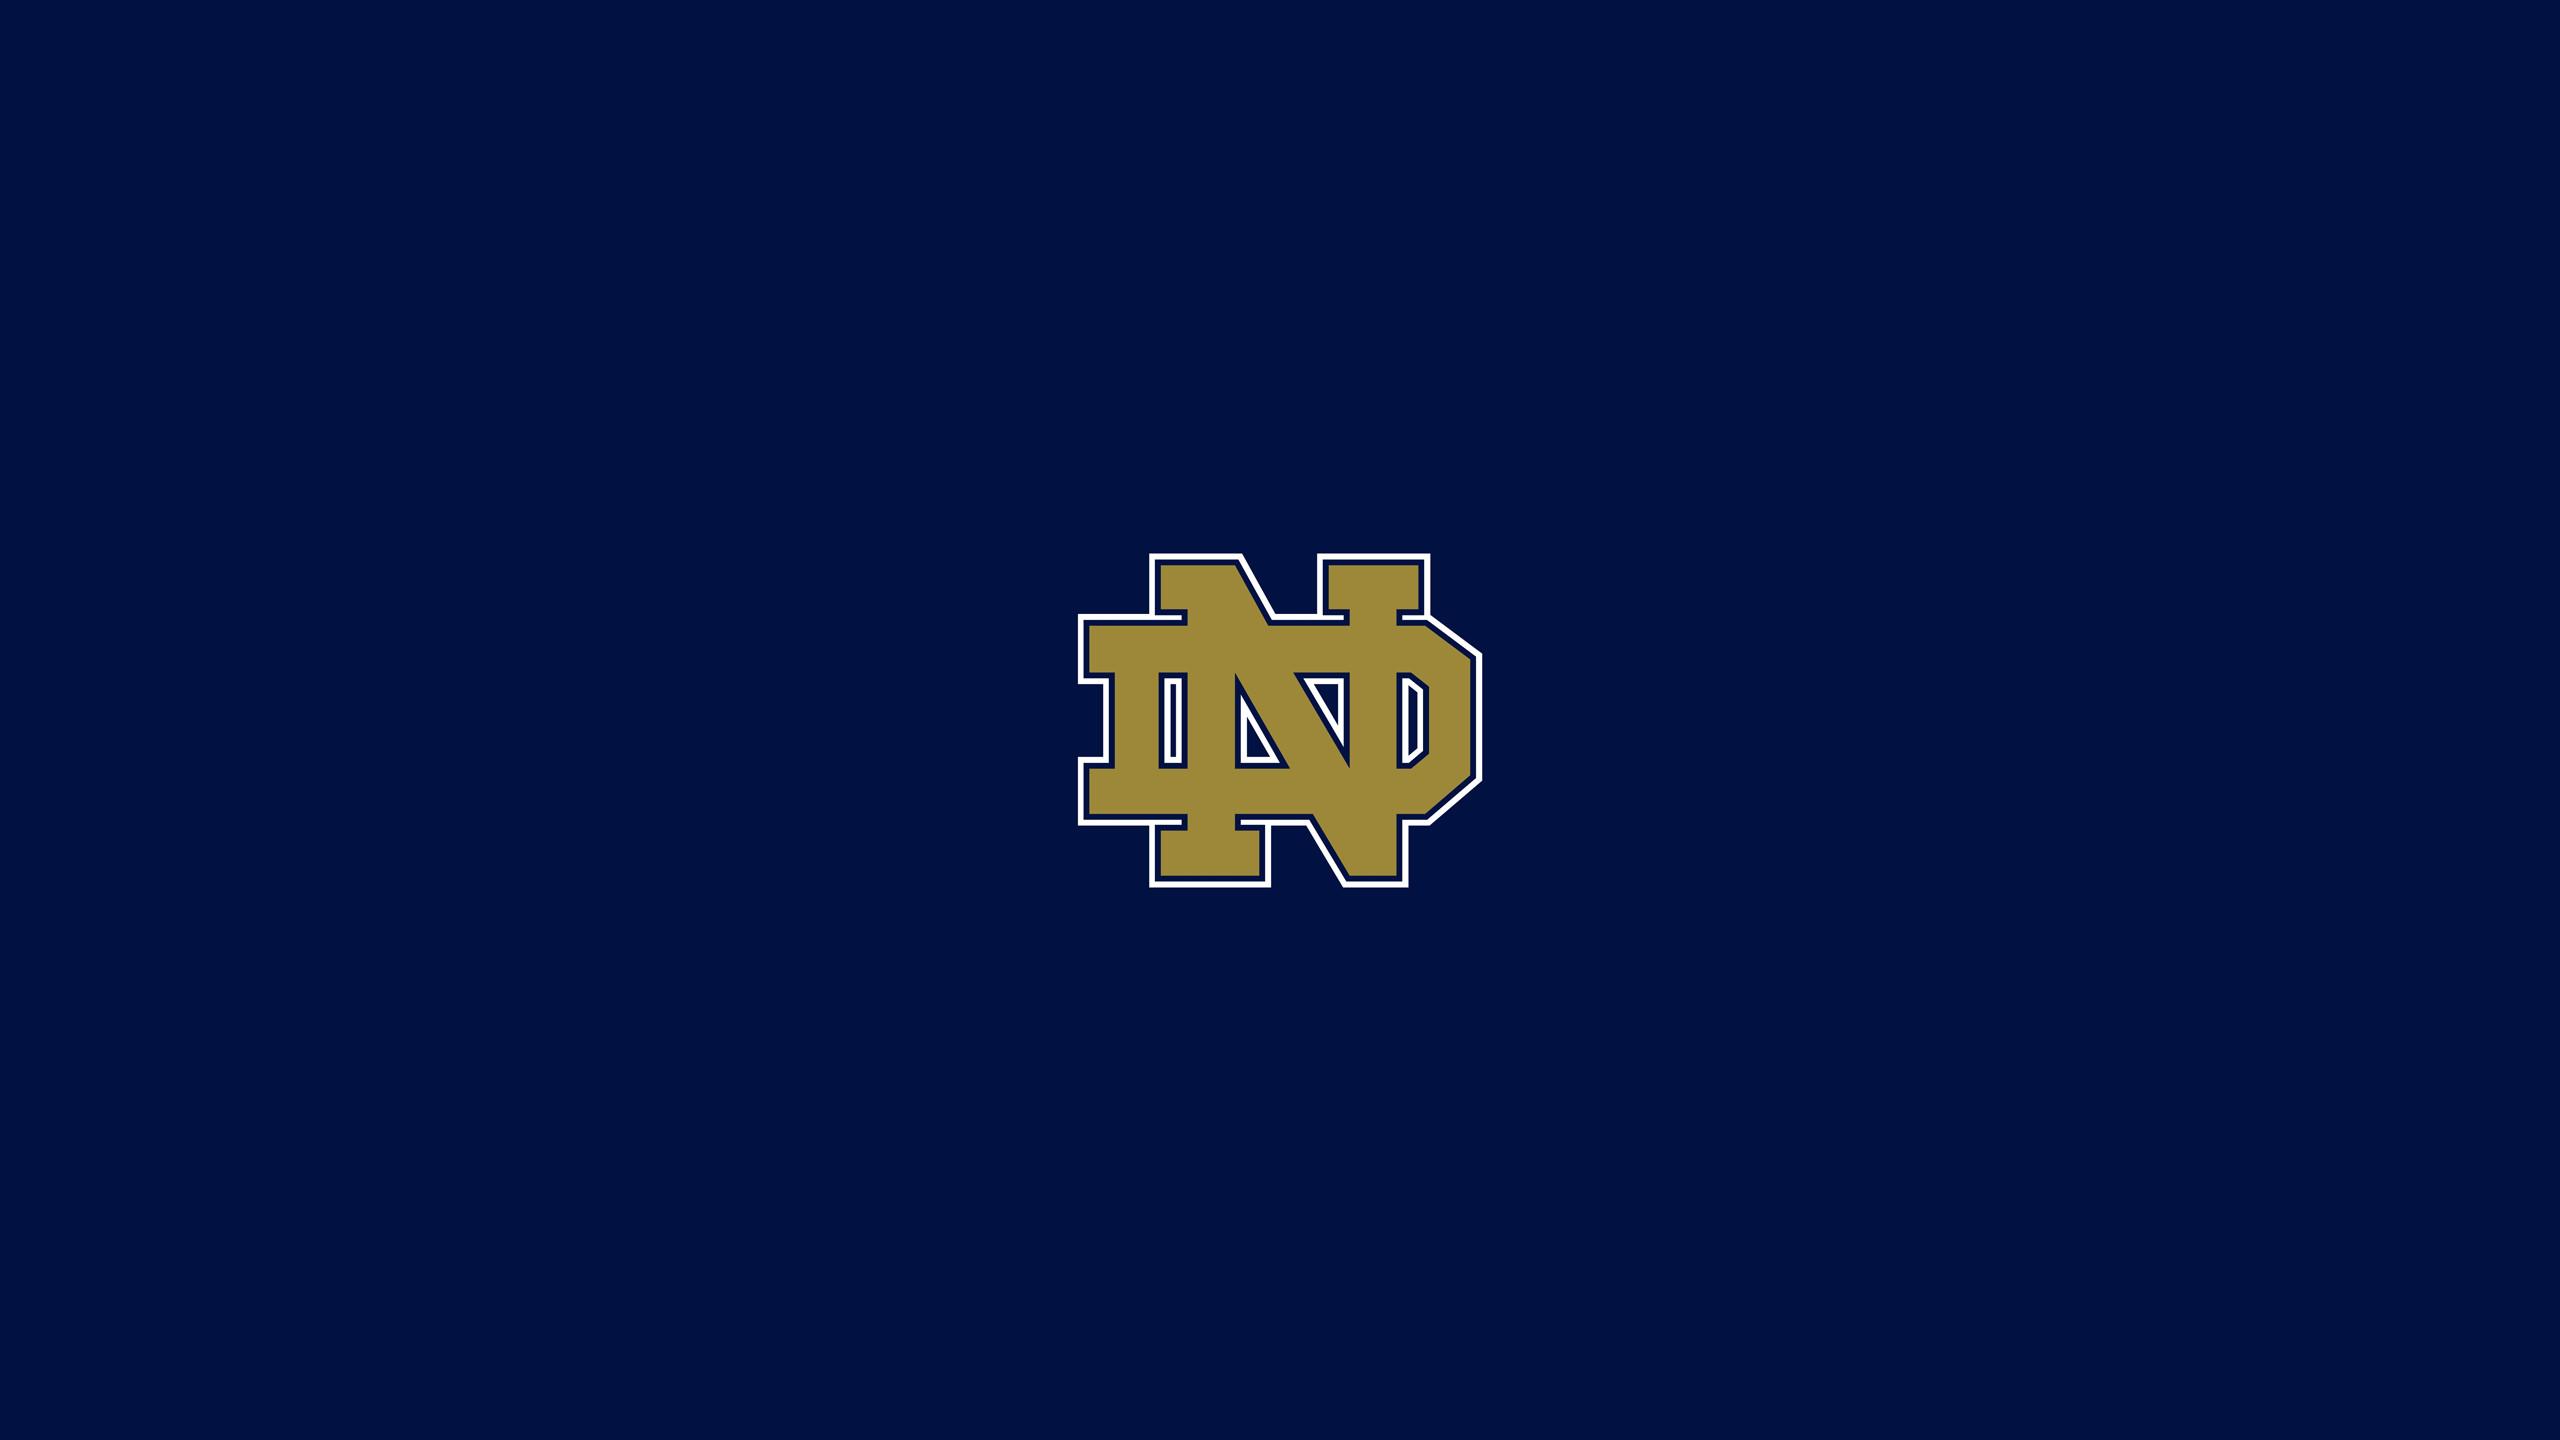 Notre Dame Wallpaper. 2560×1440. Backgrounds